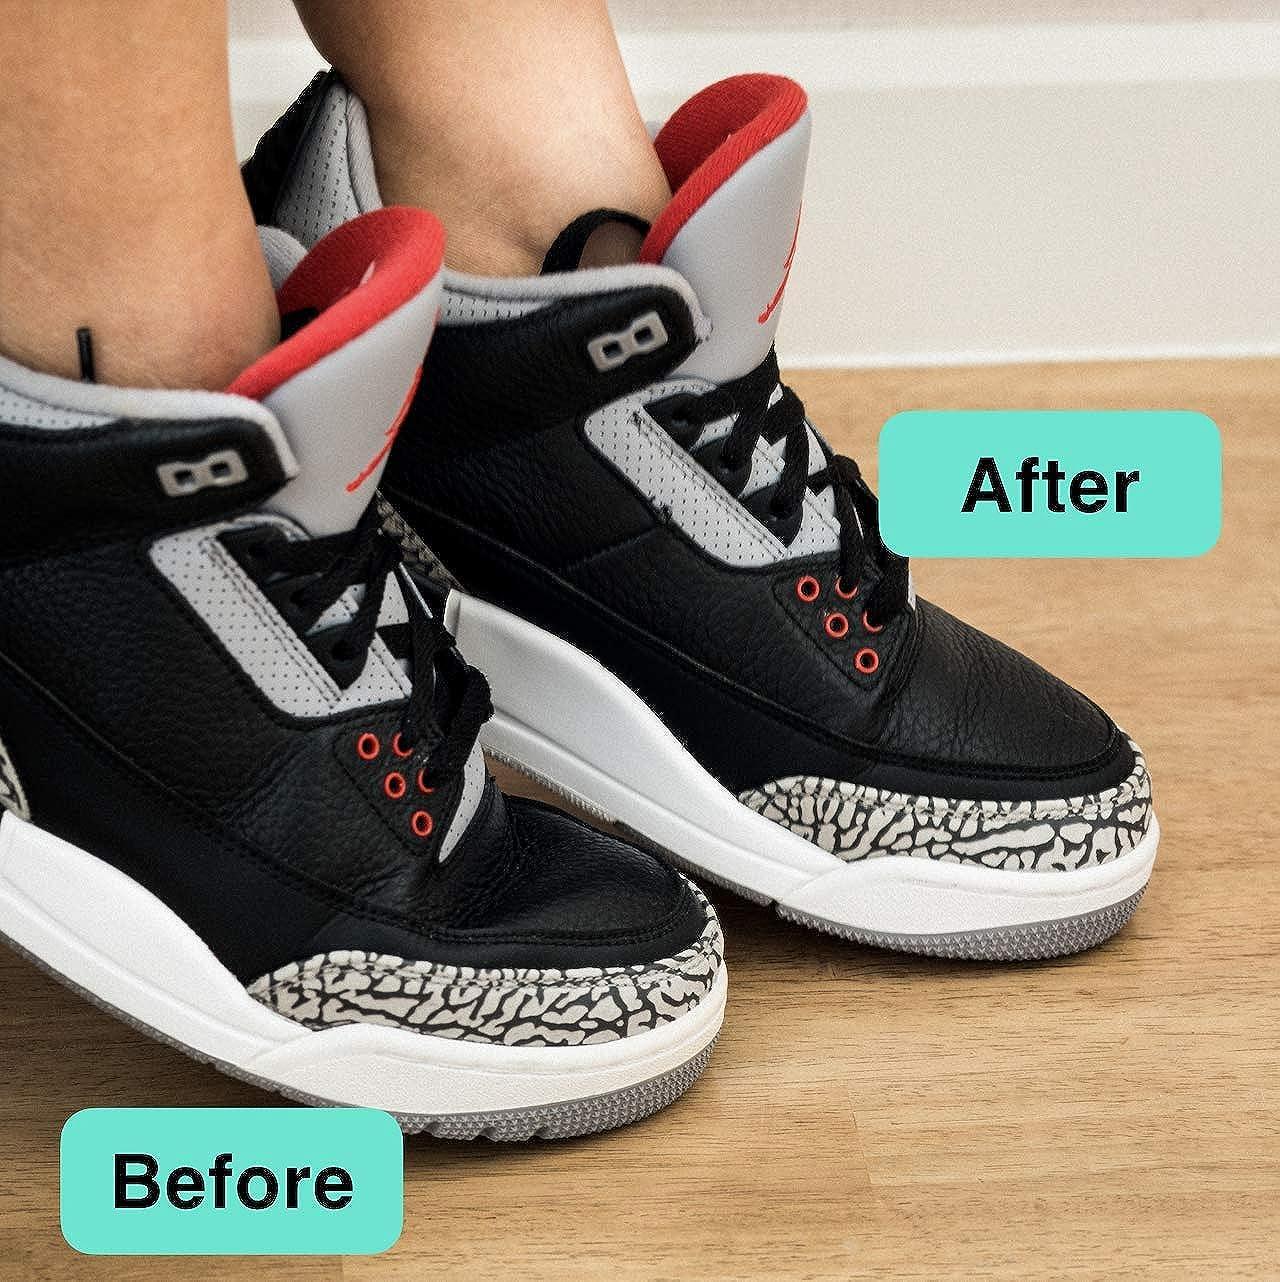 Wilkins Shoe Crease Protector - (2 pairs) Toe Box Decreaser And Crease Protectors